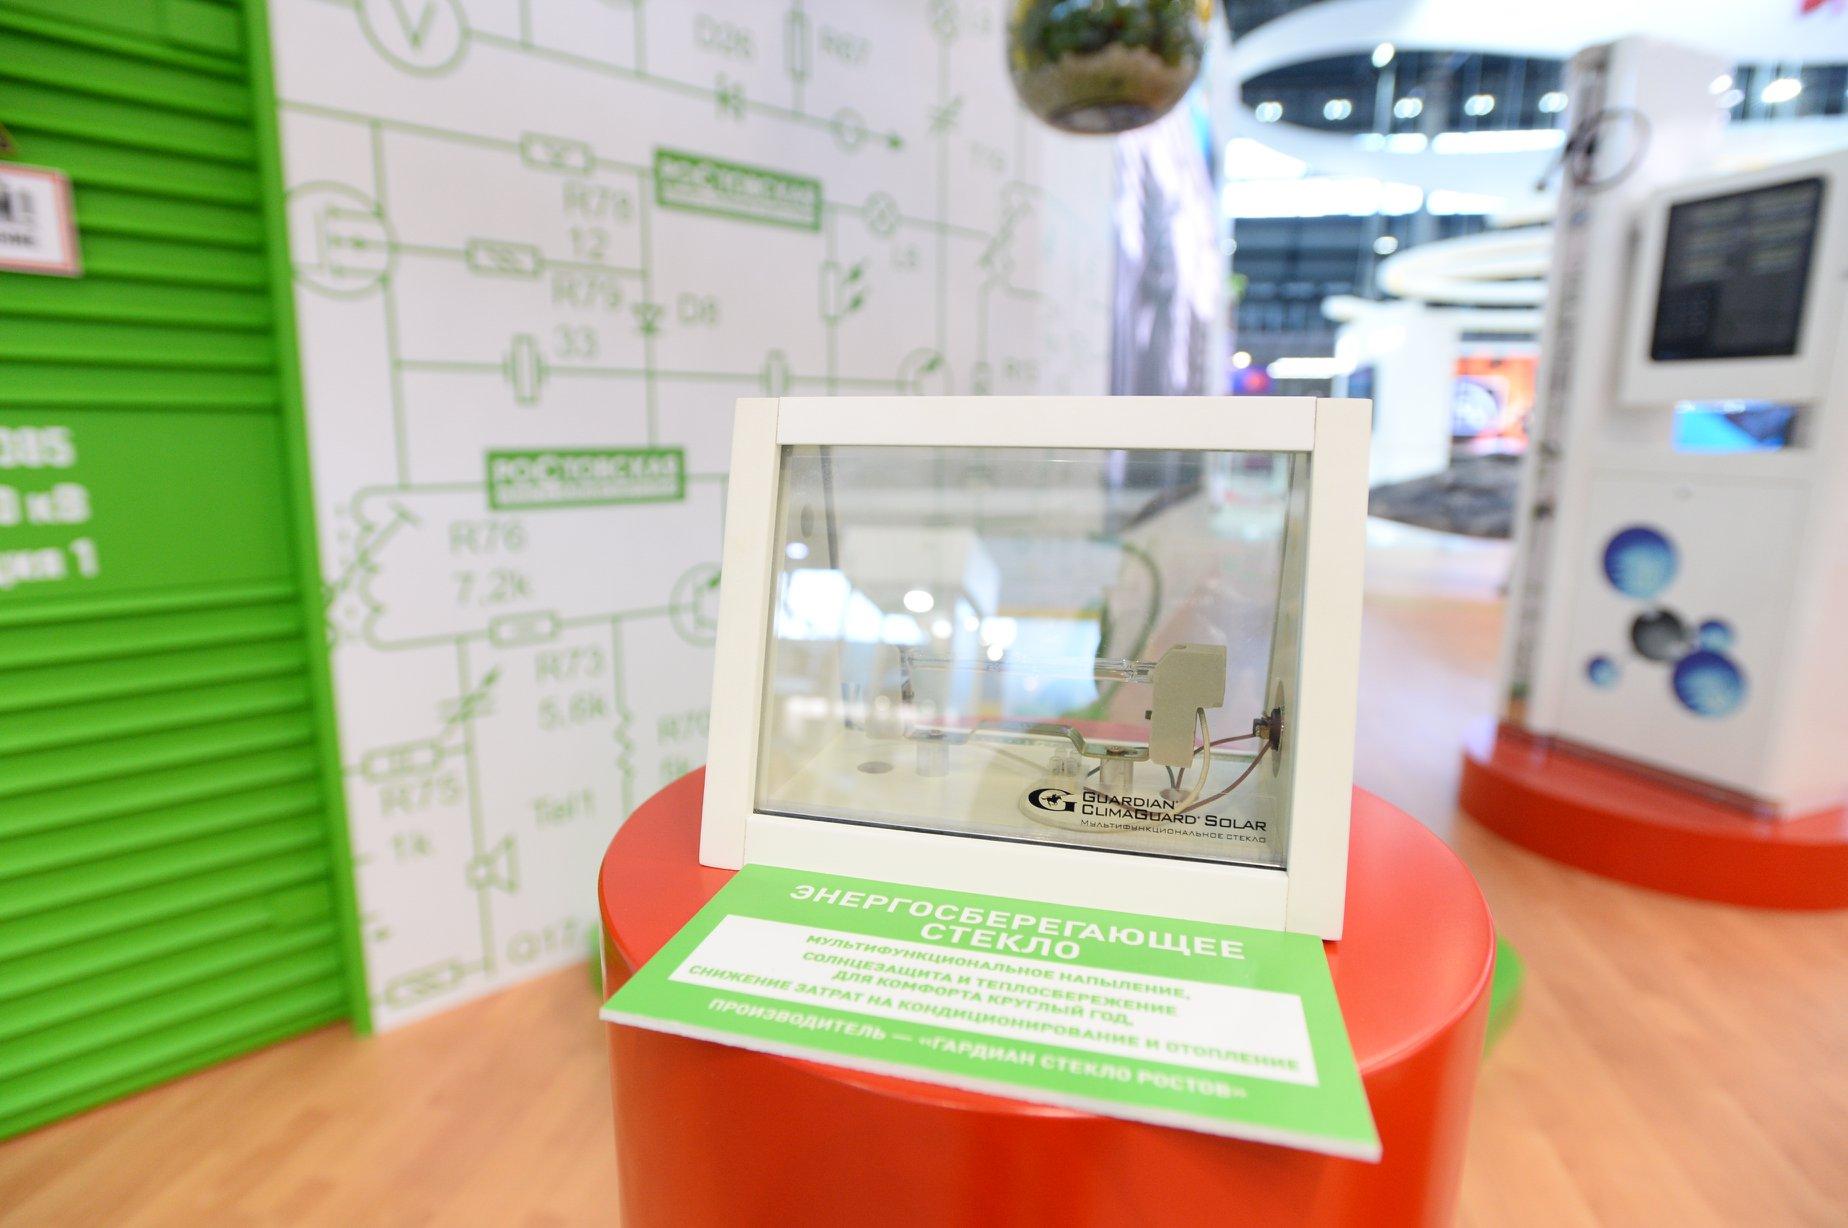 Инновации от «Гардиан Стекло Ростов» представили на «Иннопроме»